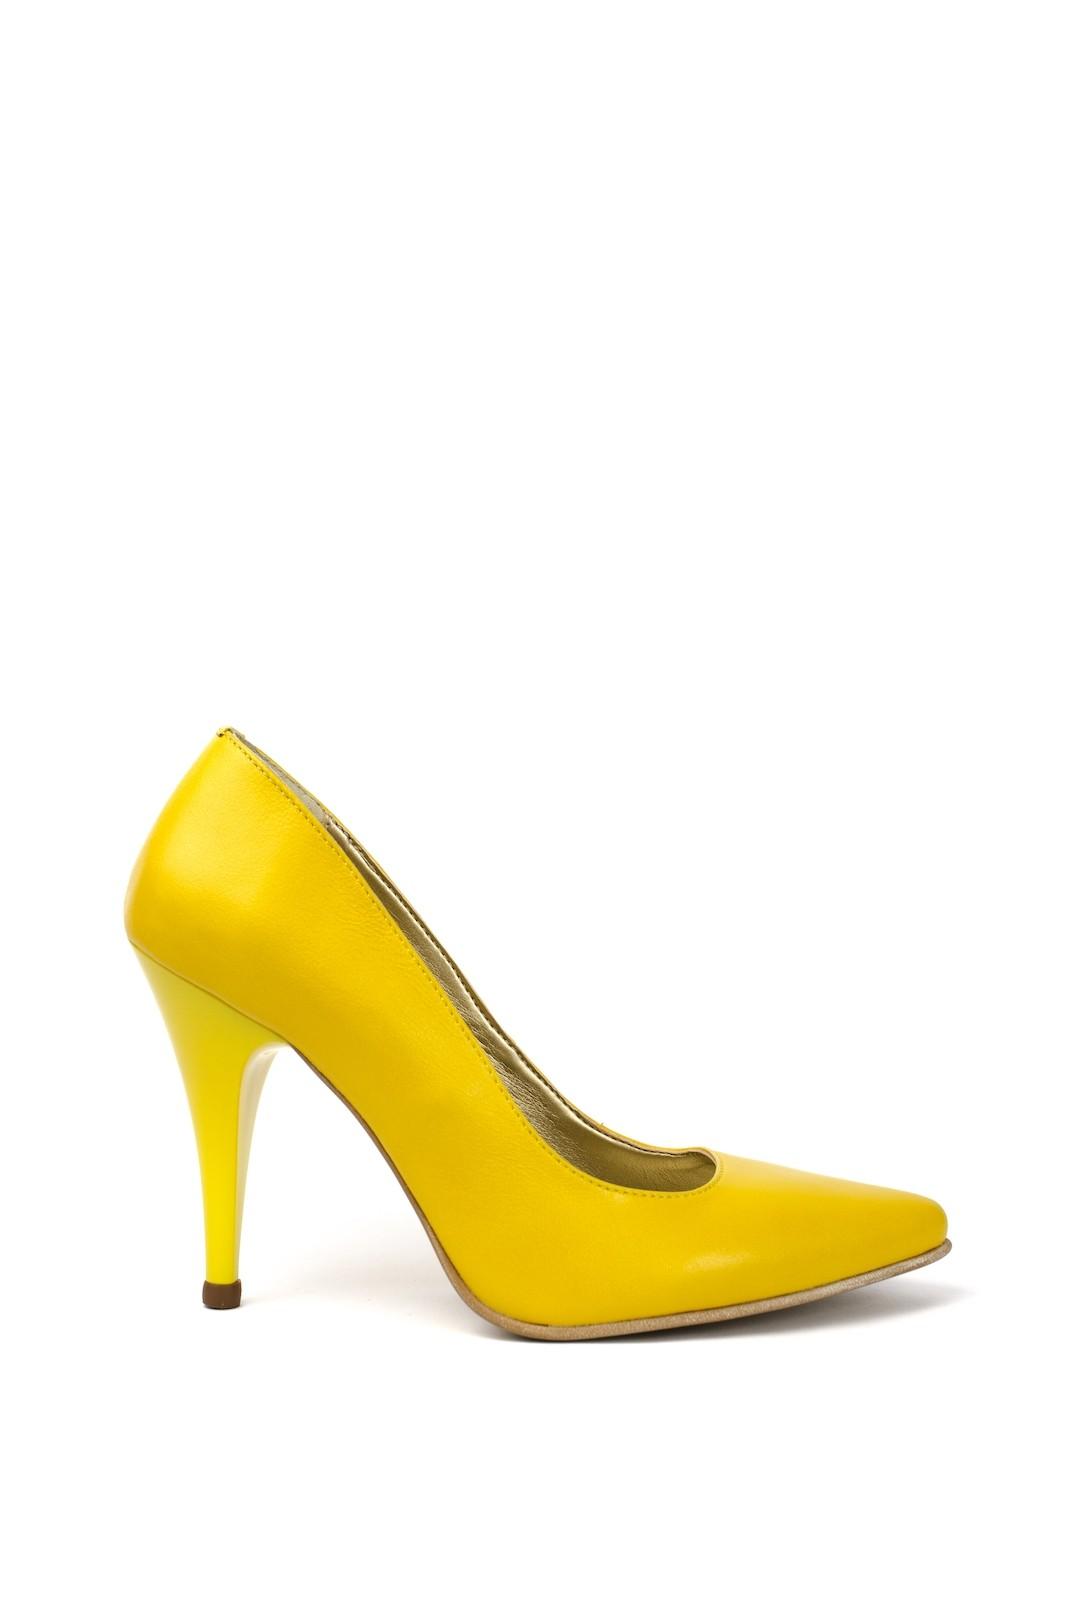 Pantofi Dama piele naturala galben Adelina